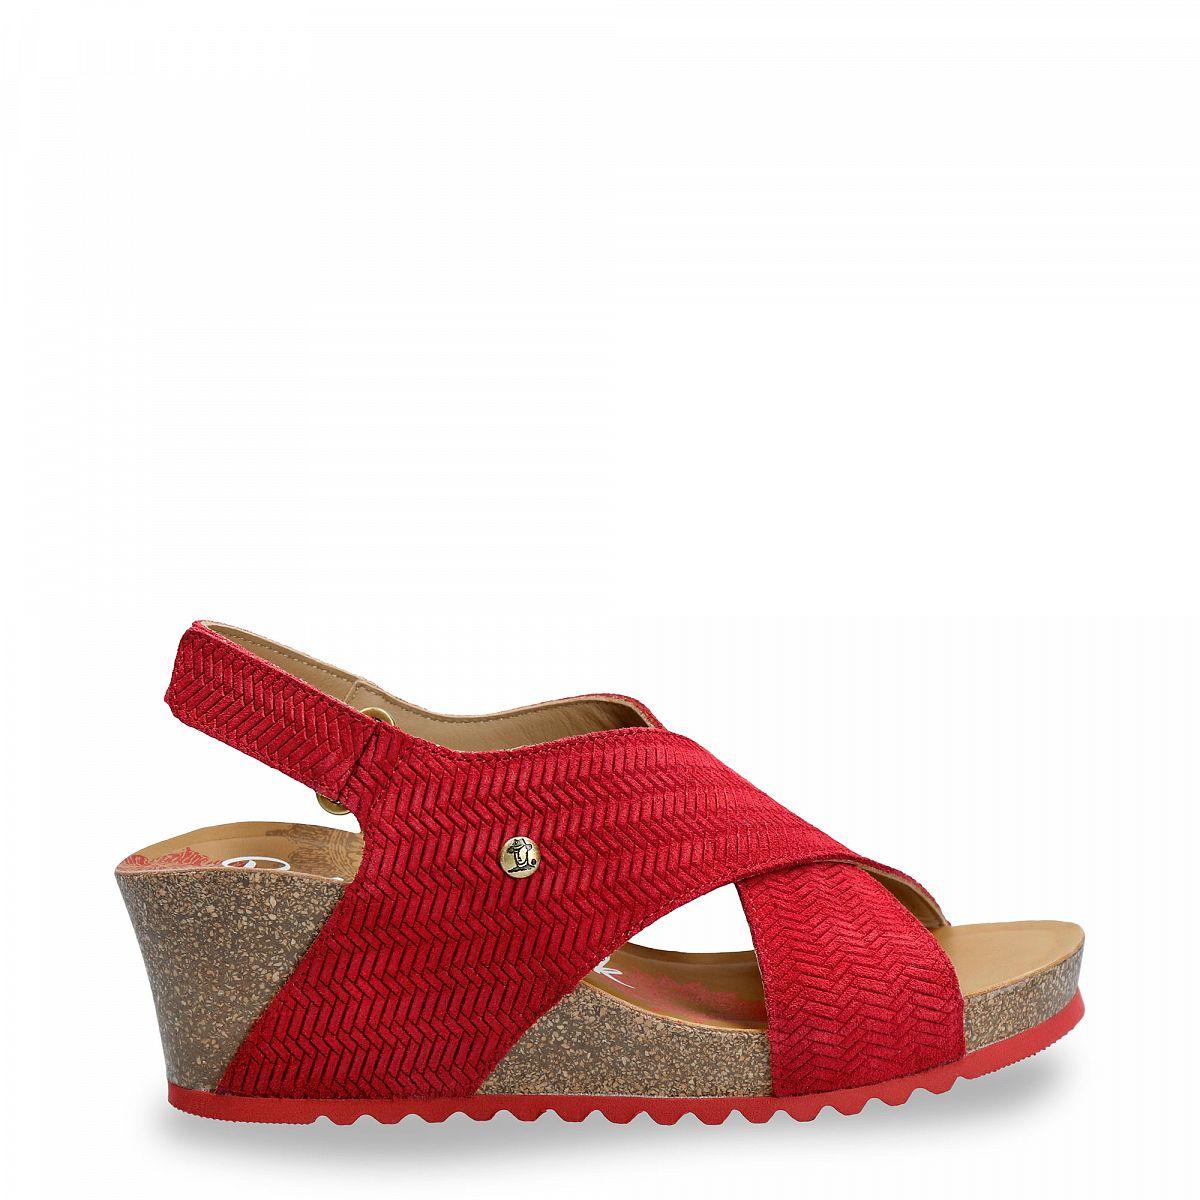 Womens Sandals Valeska Menorca Red Panama Jack